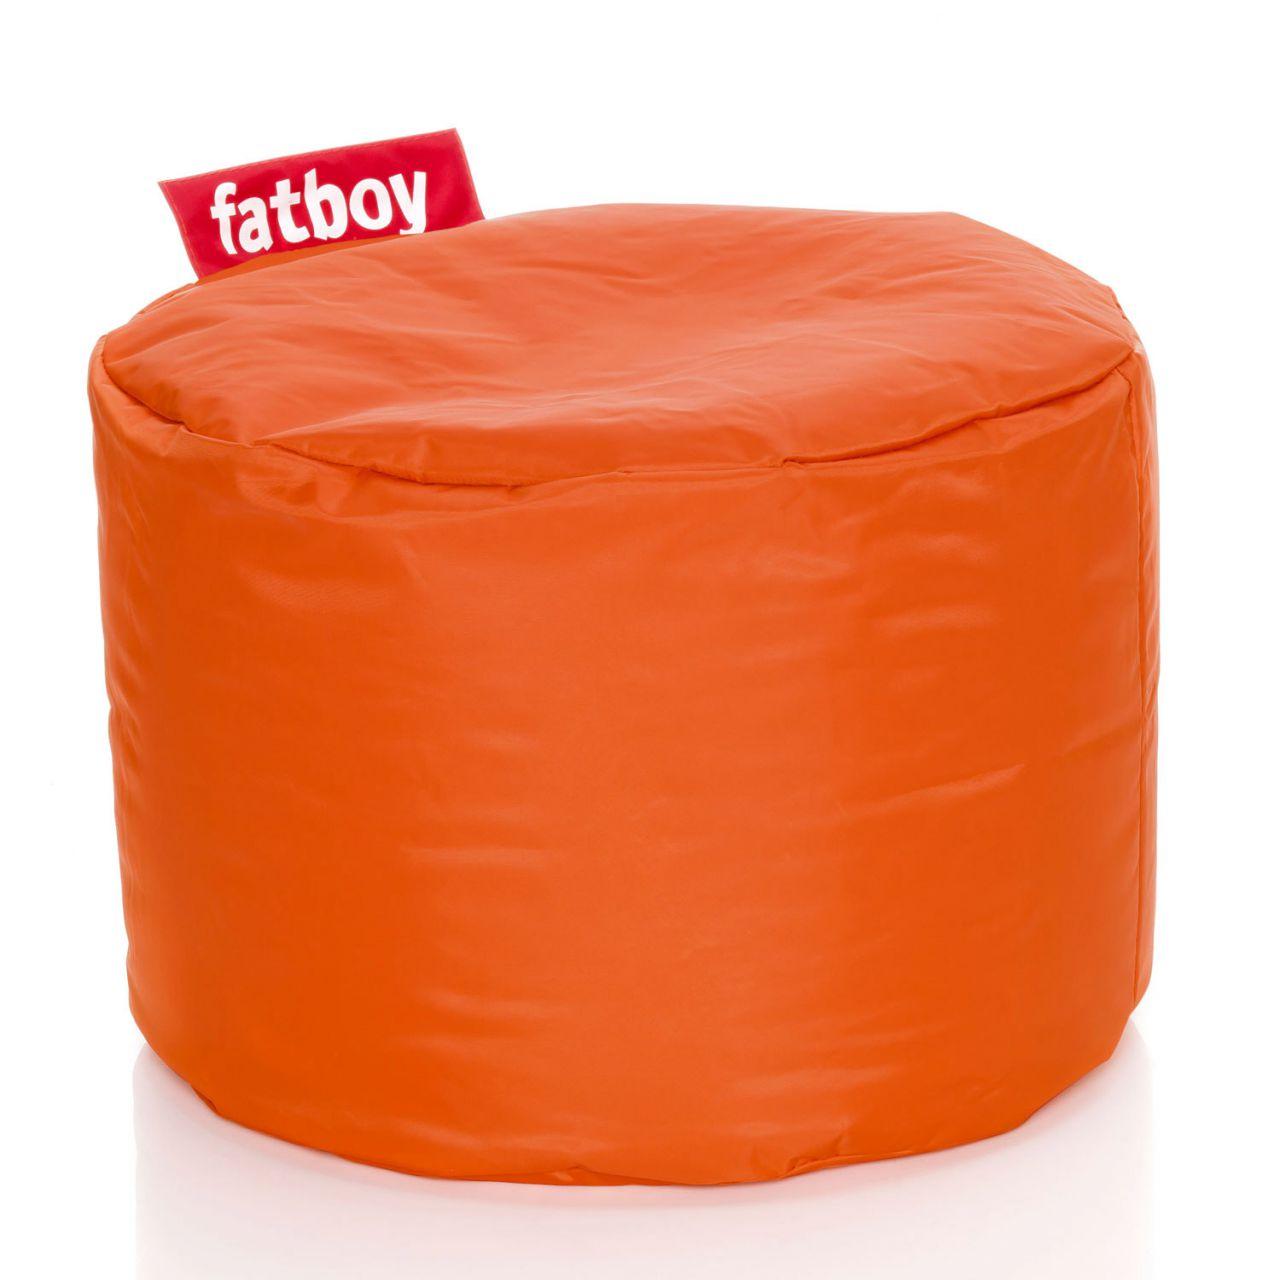 Fatboy - Point Sitzhocker 900.0038